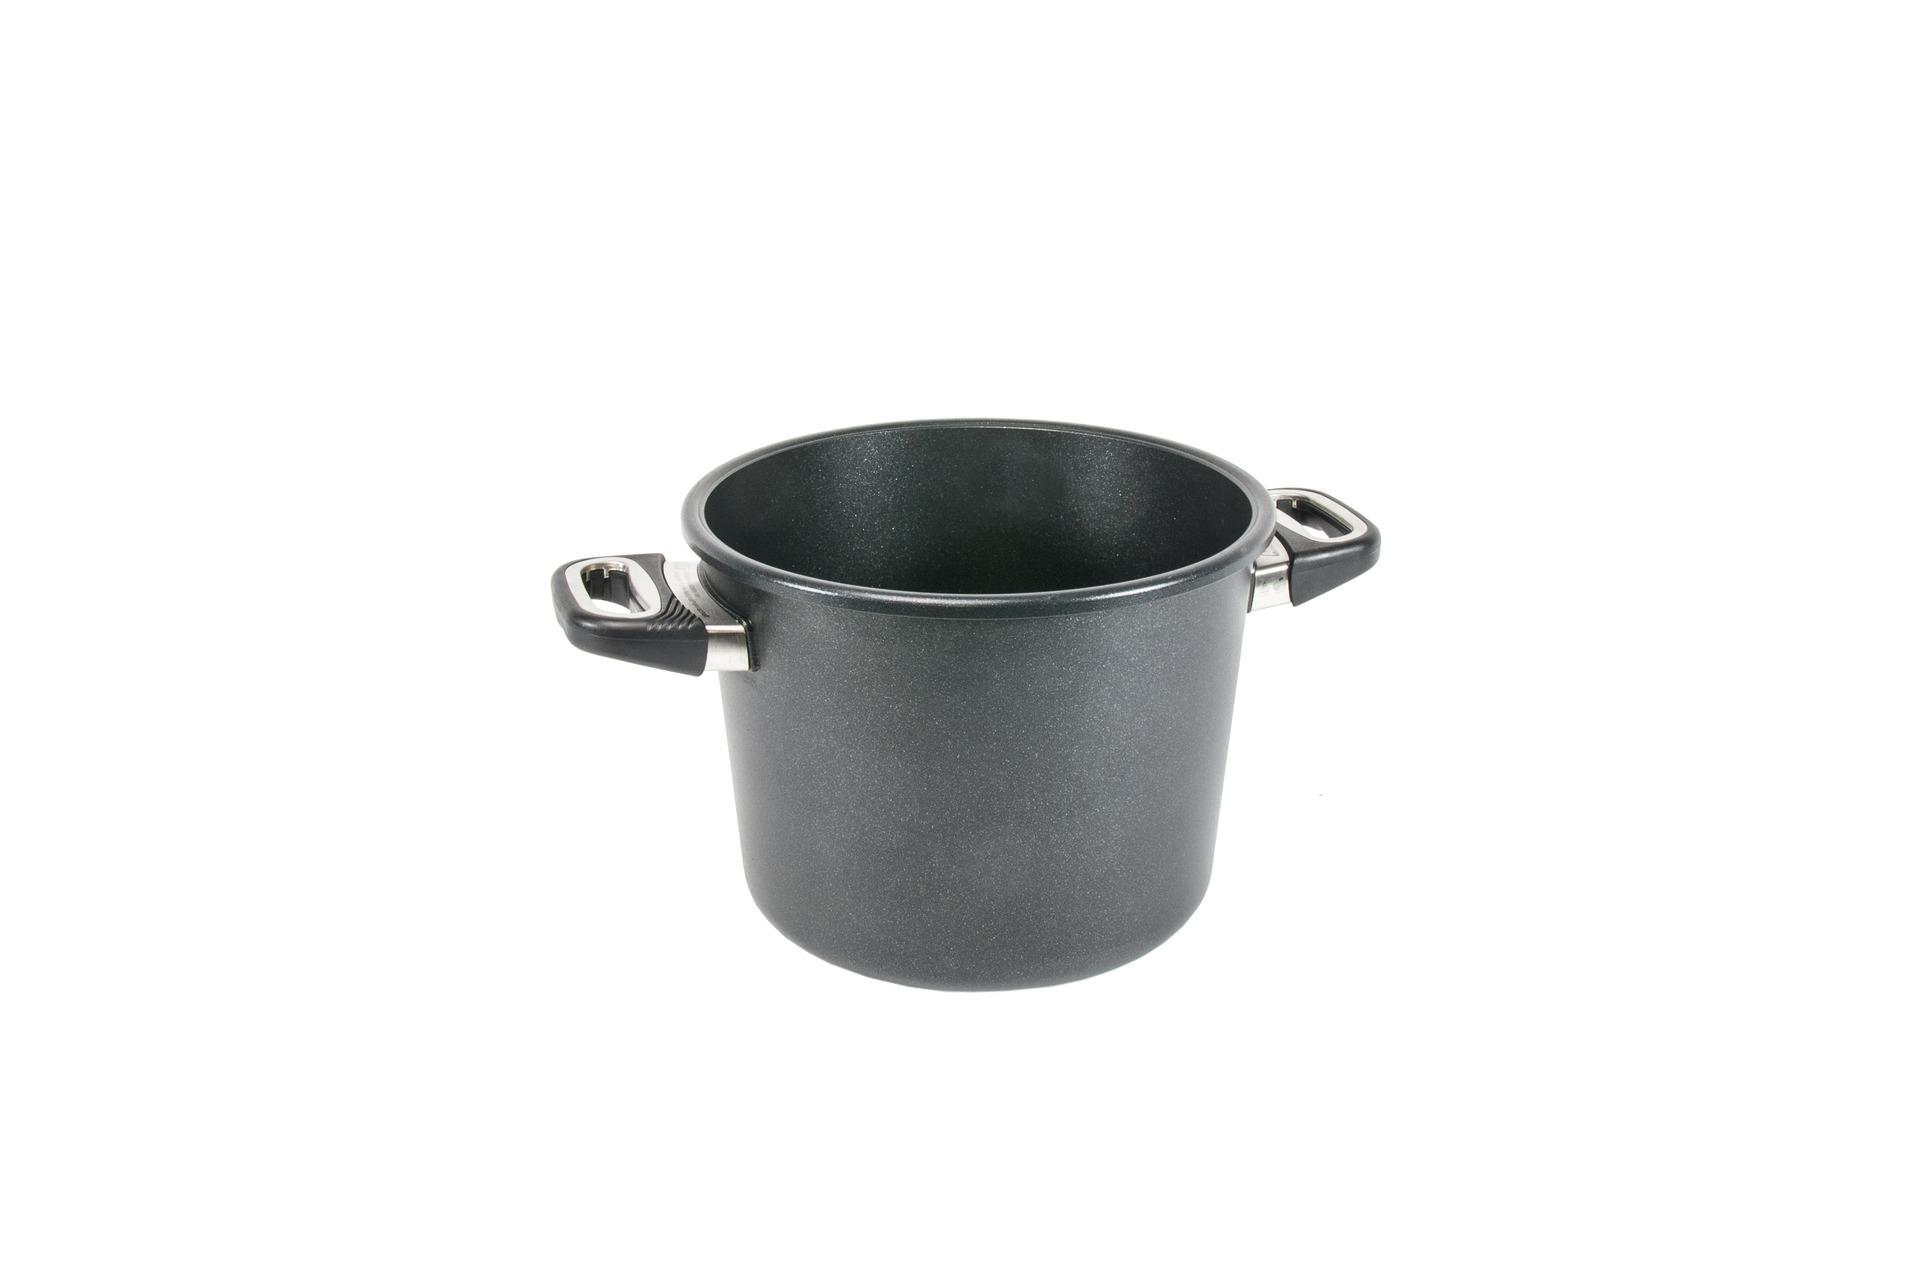 Induktion-Schnellkochtopf 5,50 l / 240 mm